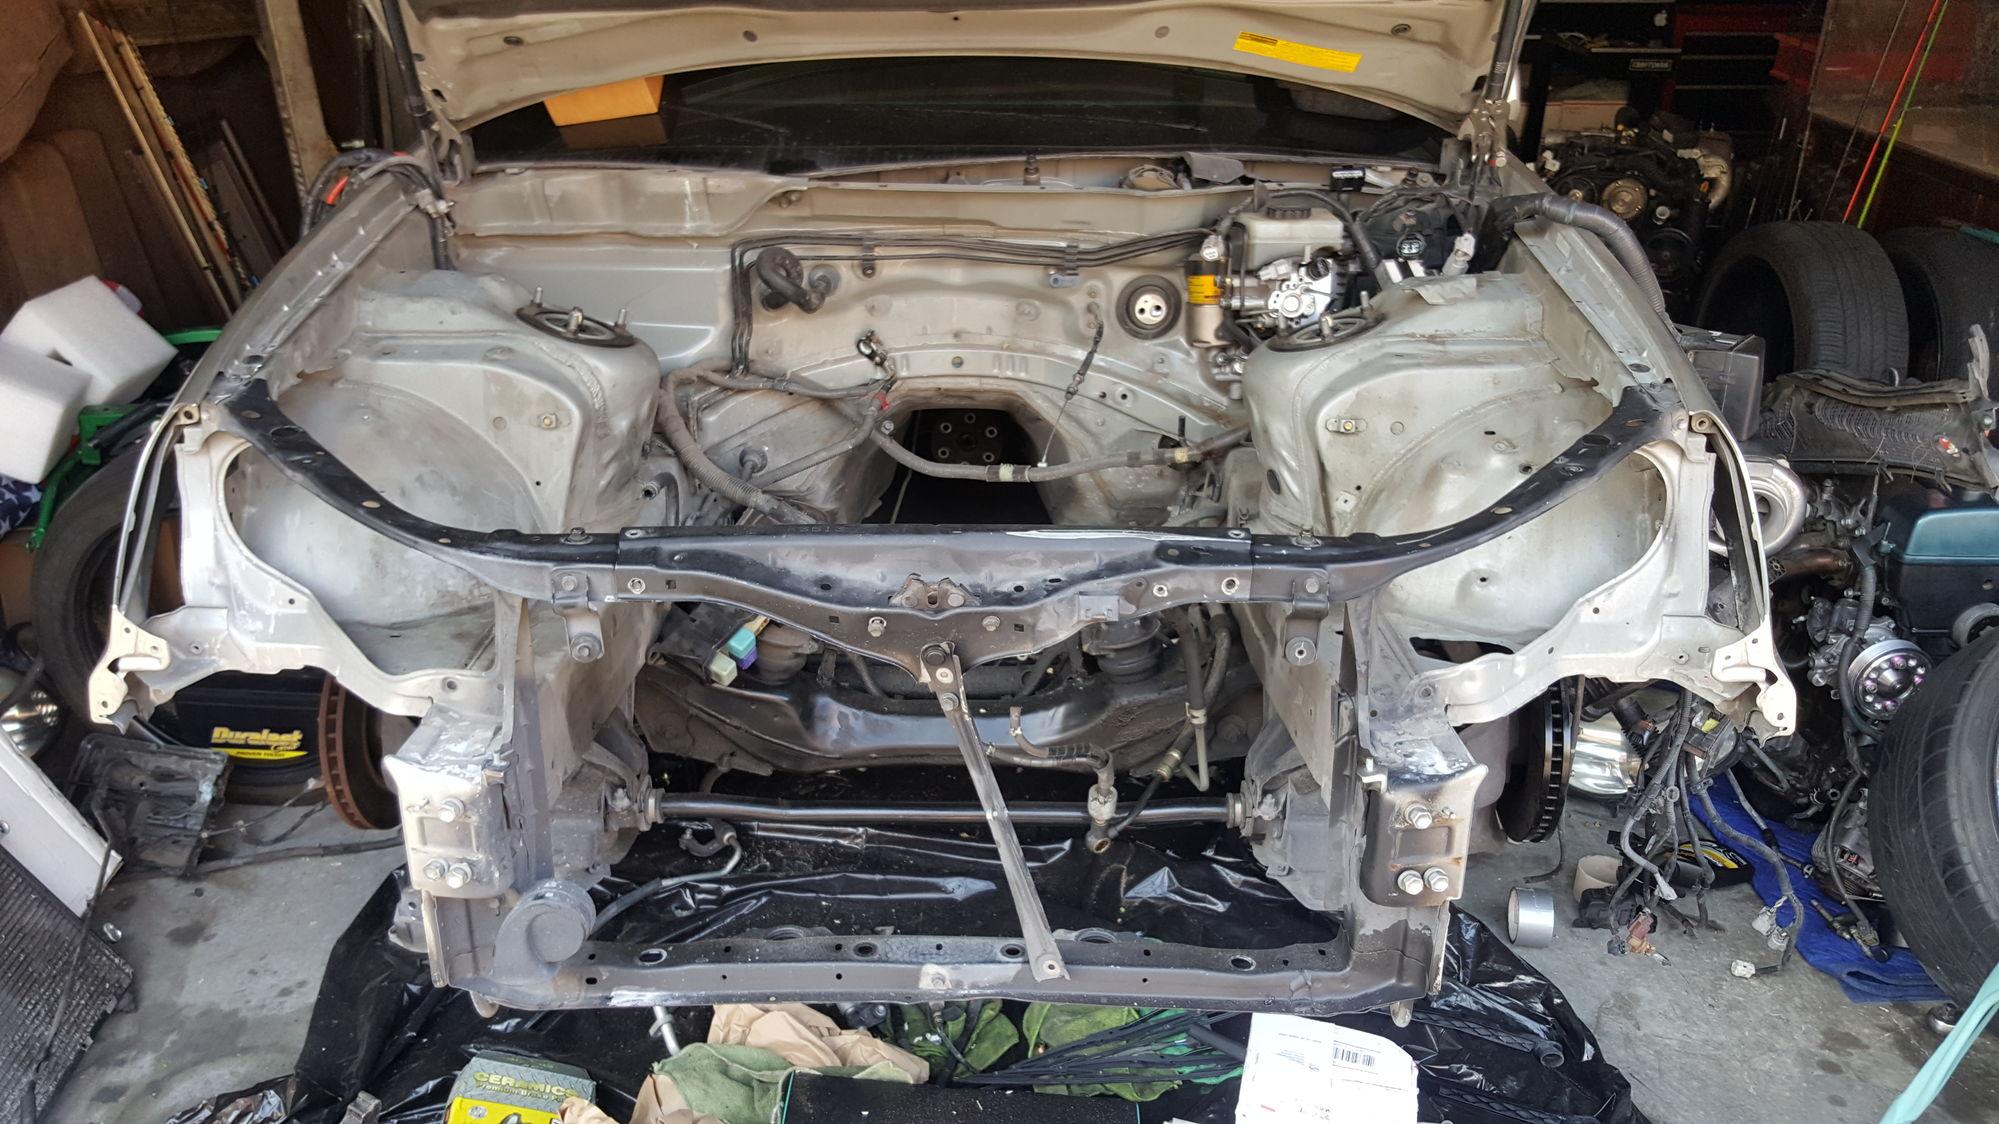 Toyota Supra Fuse Box Relocation Wiring Diagram 2jzgte Build Wire Tuck Clublexus Lexus 4runner